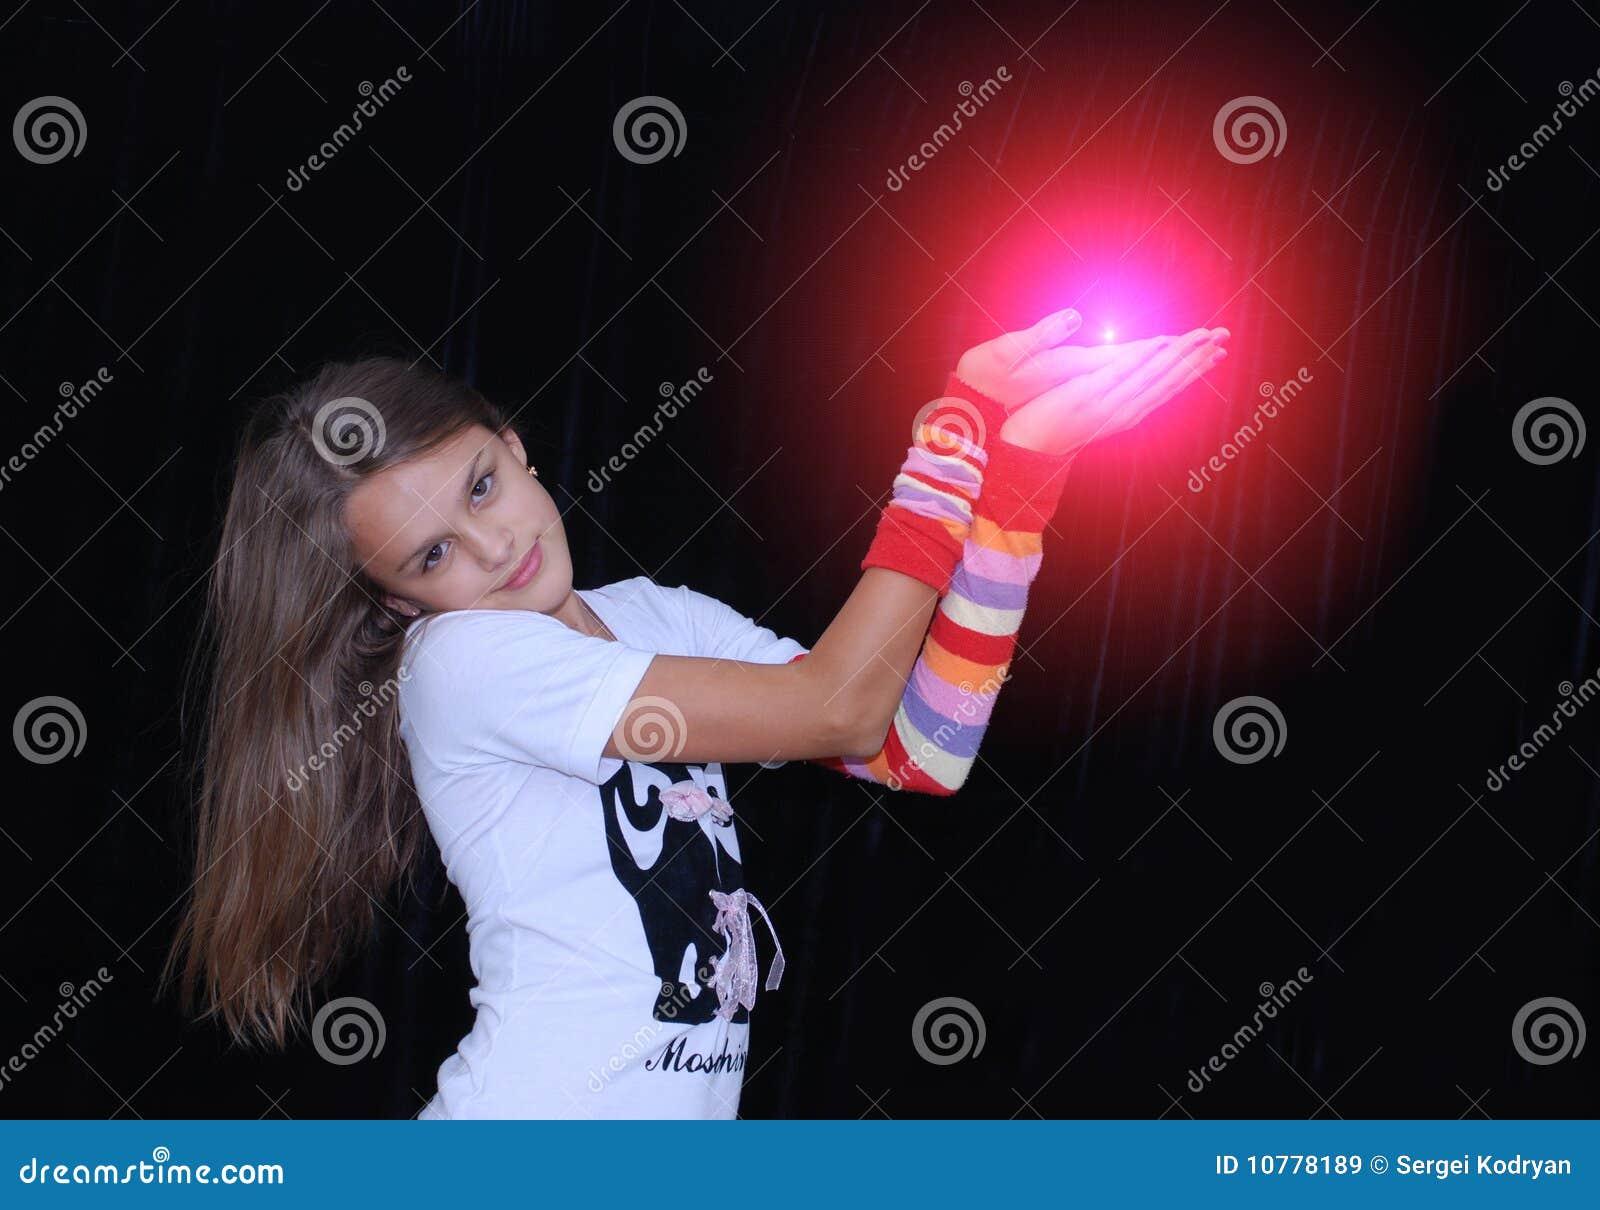 De holdings gloeiende rode orb van het meisje